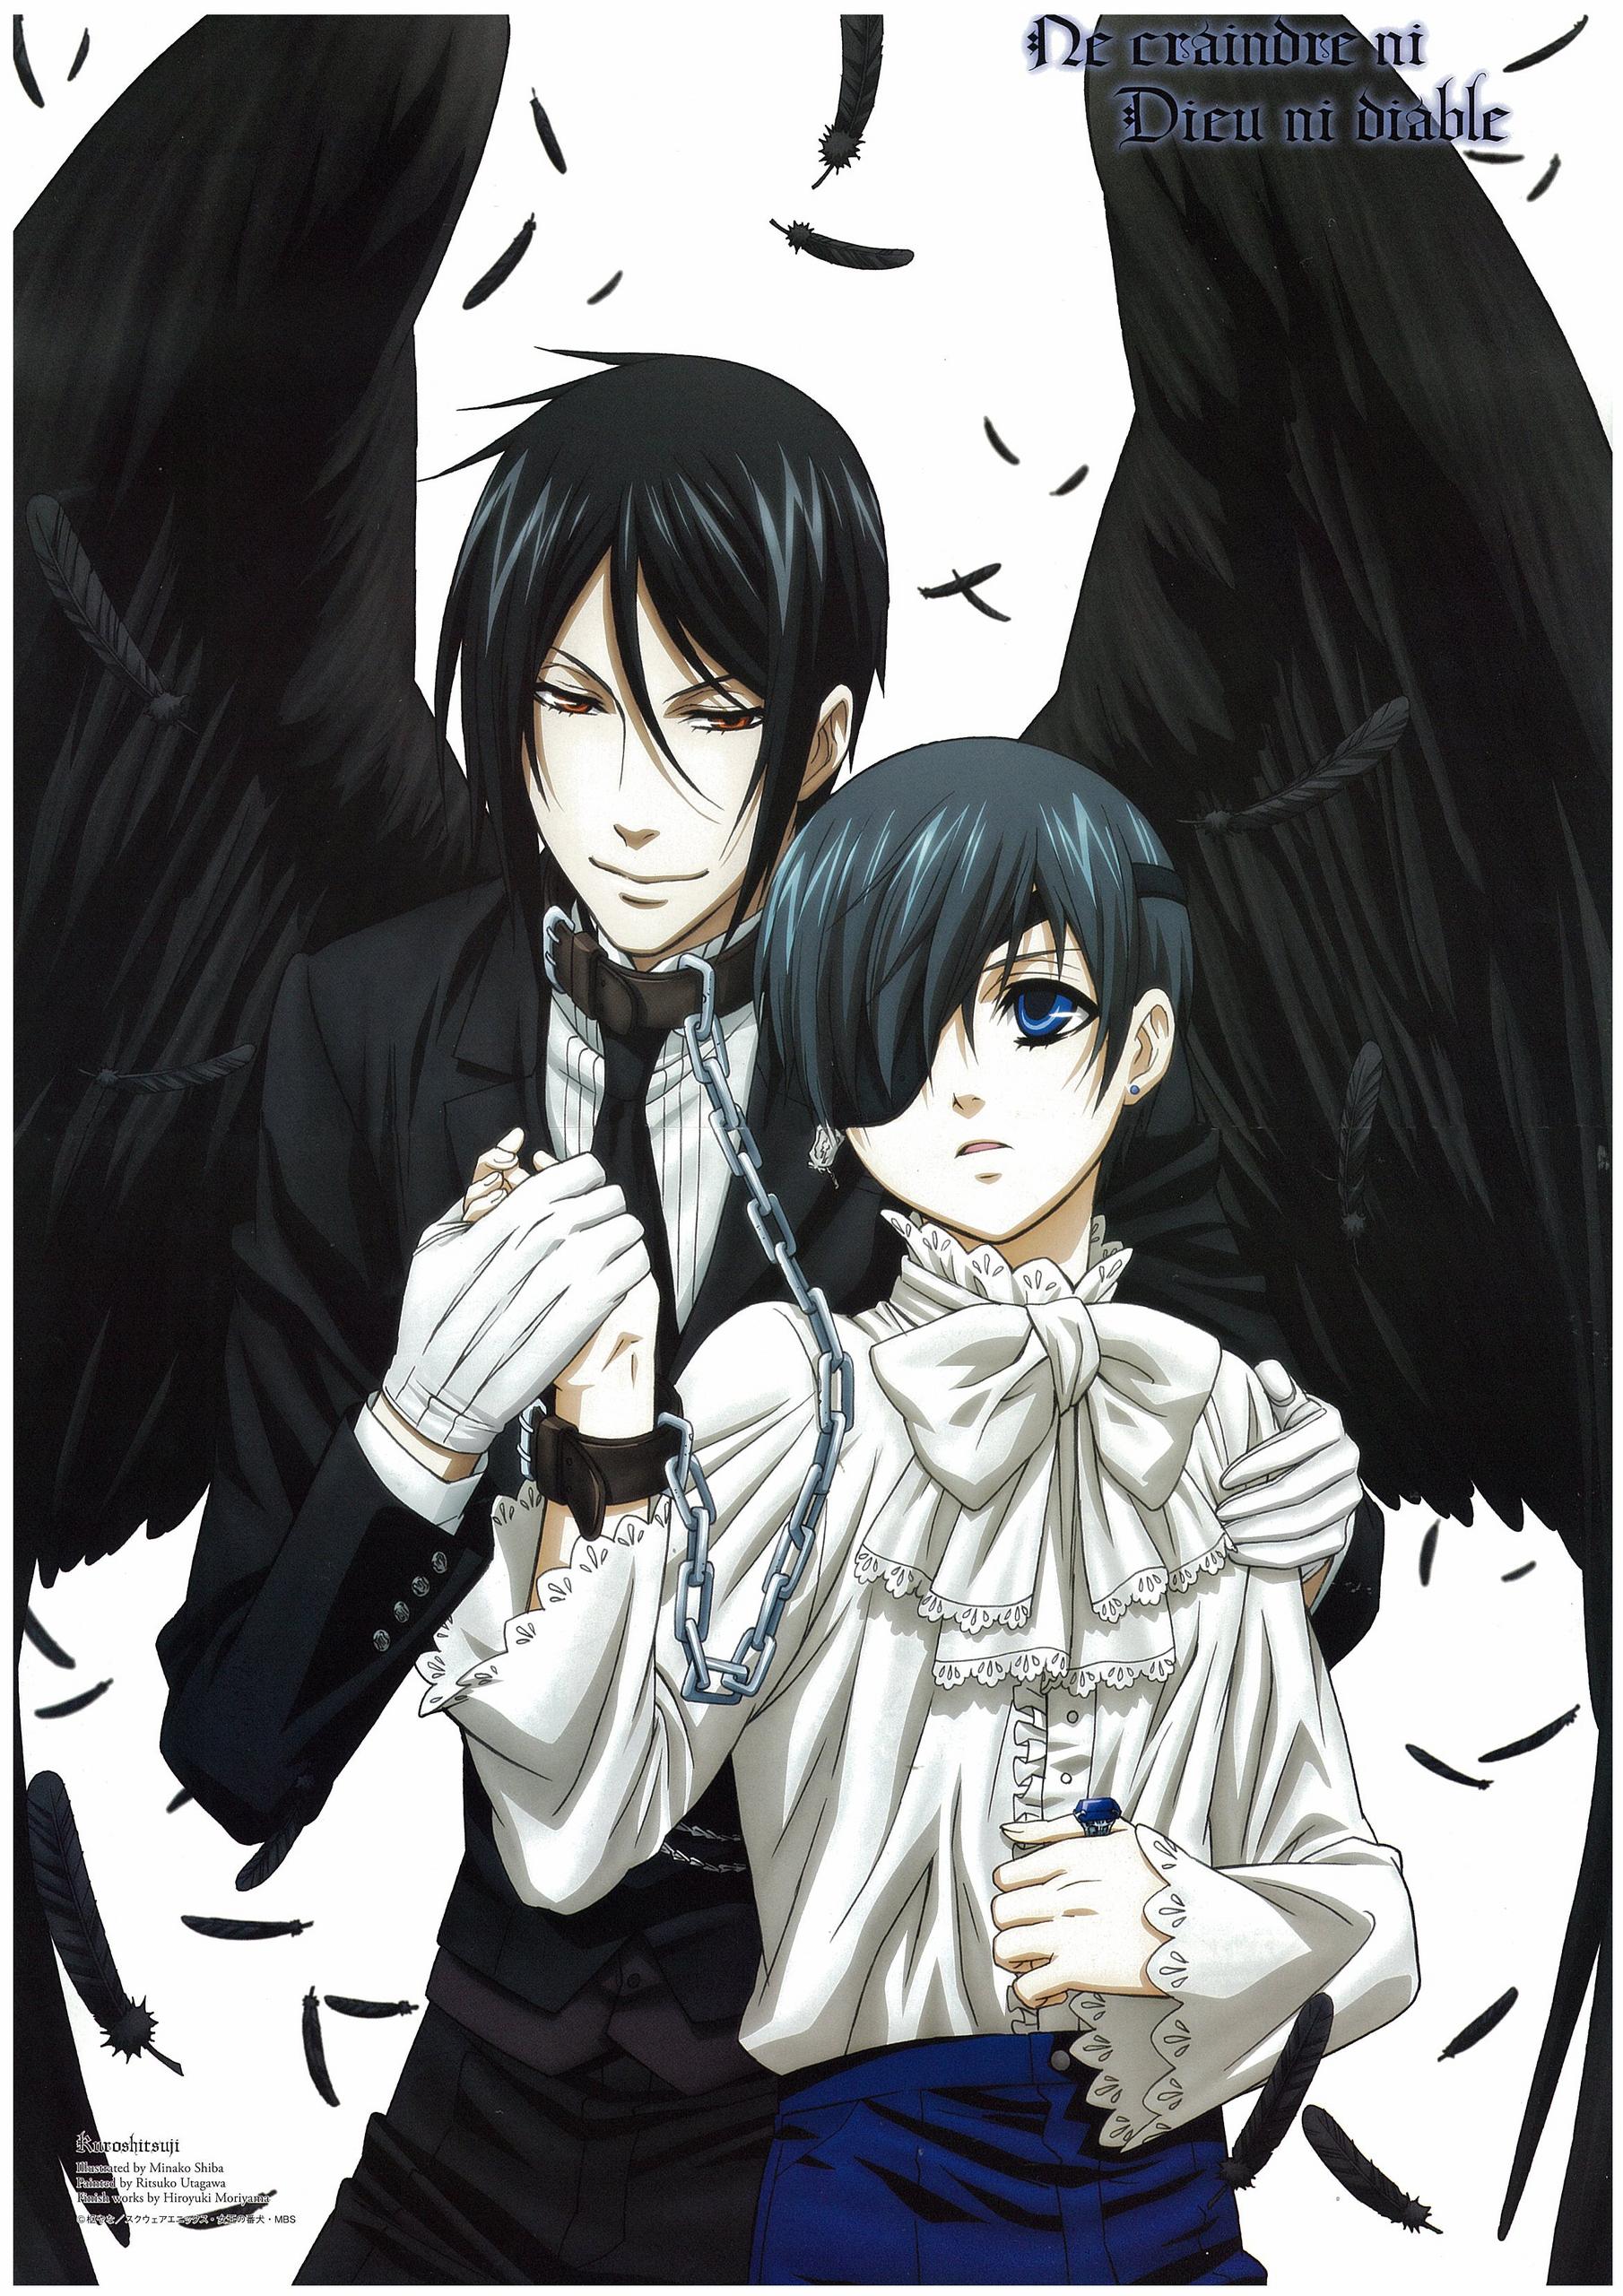 http://images5.fanpop.com/image/photos/26000000/Love-kuroshitsuji-26017933-1810-2560.jpg